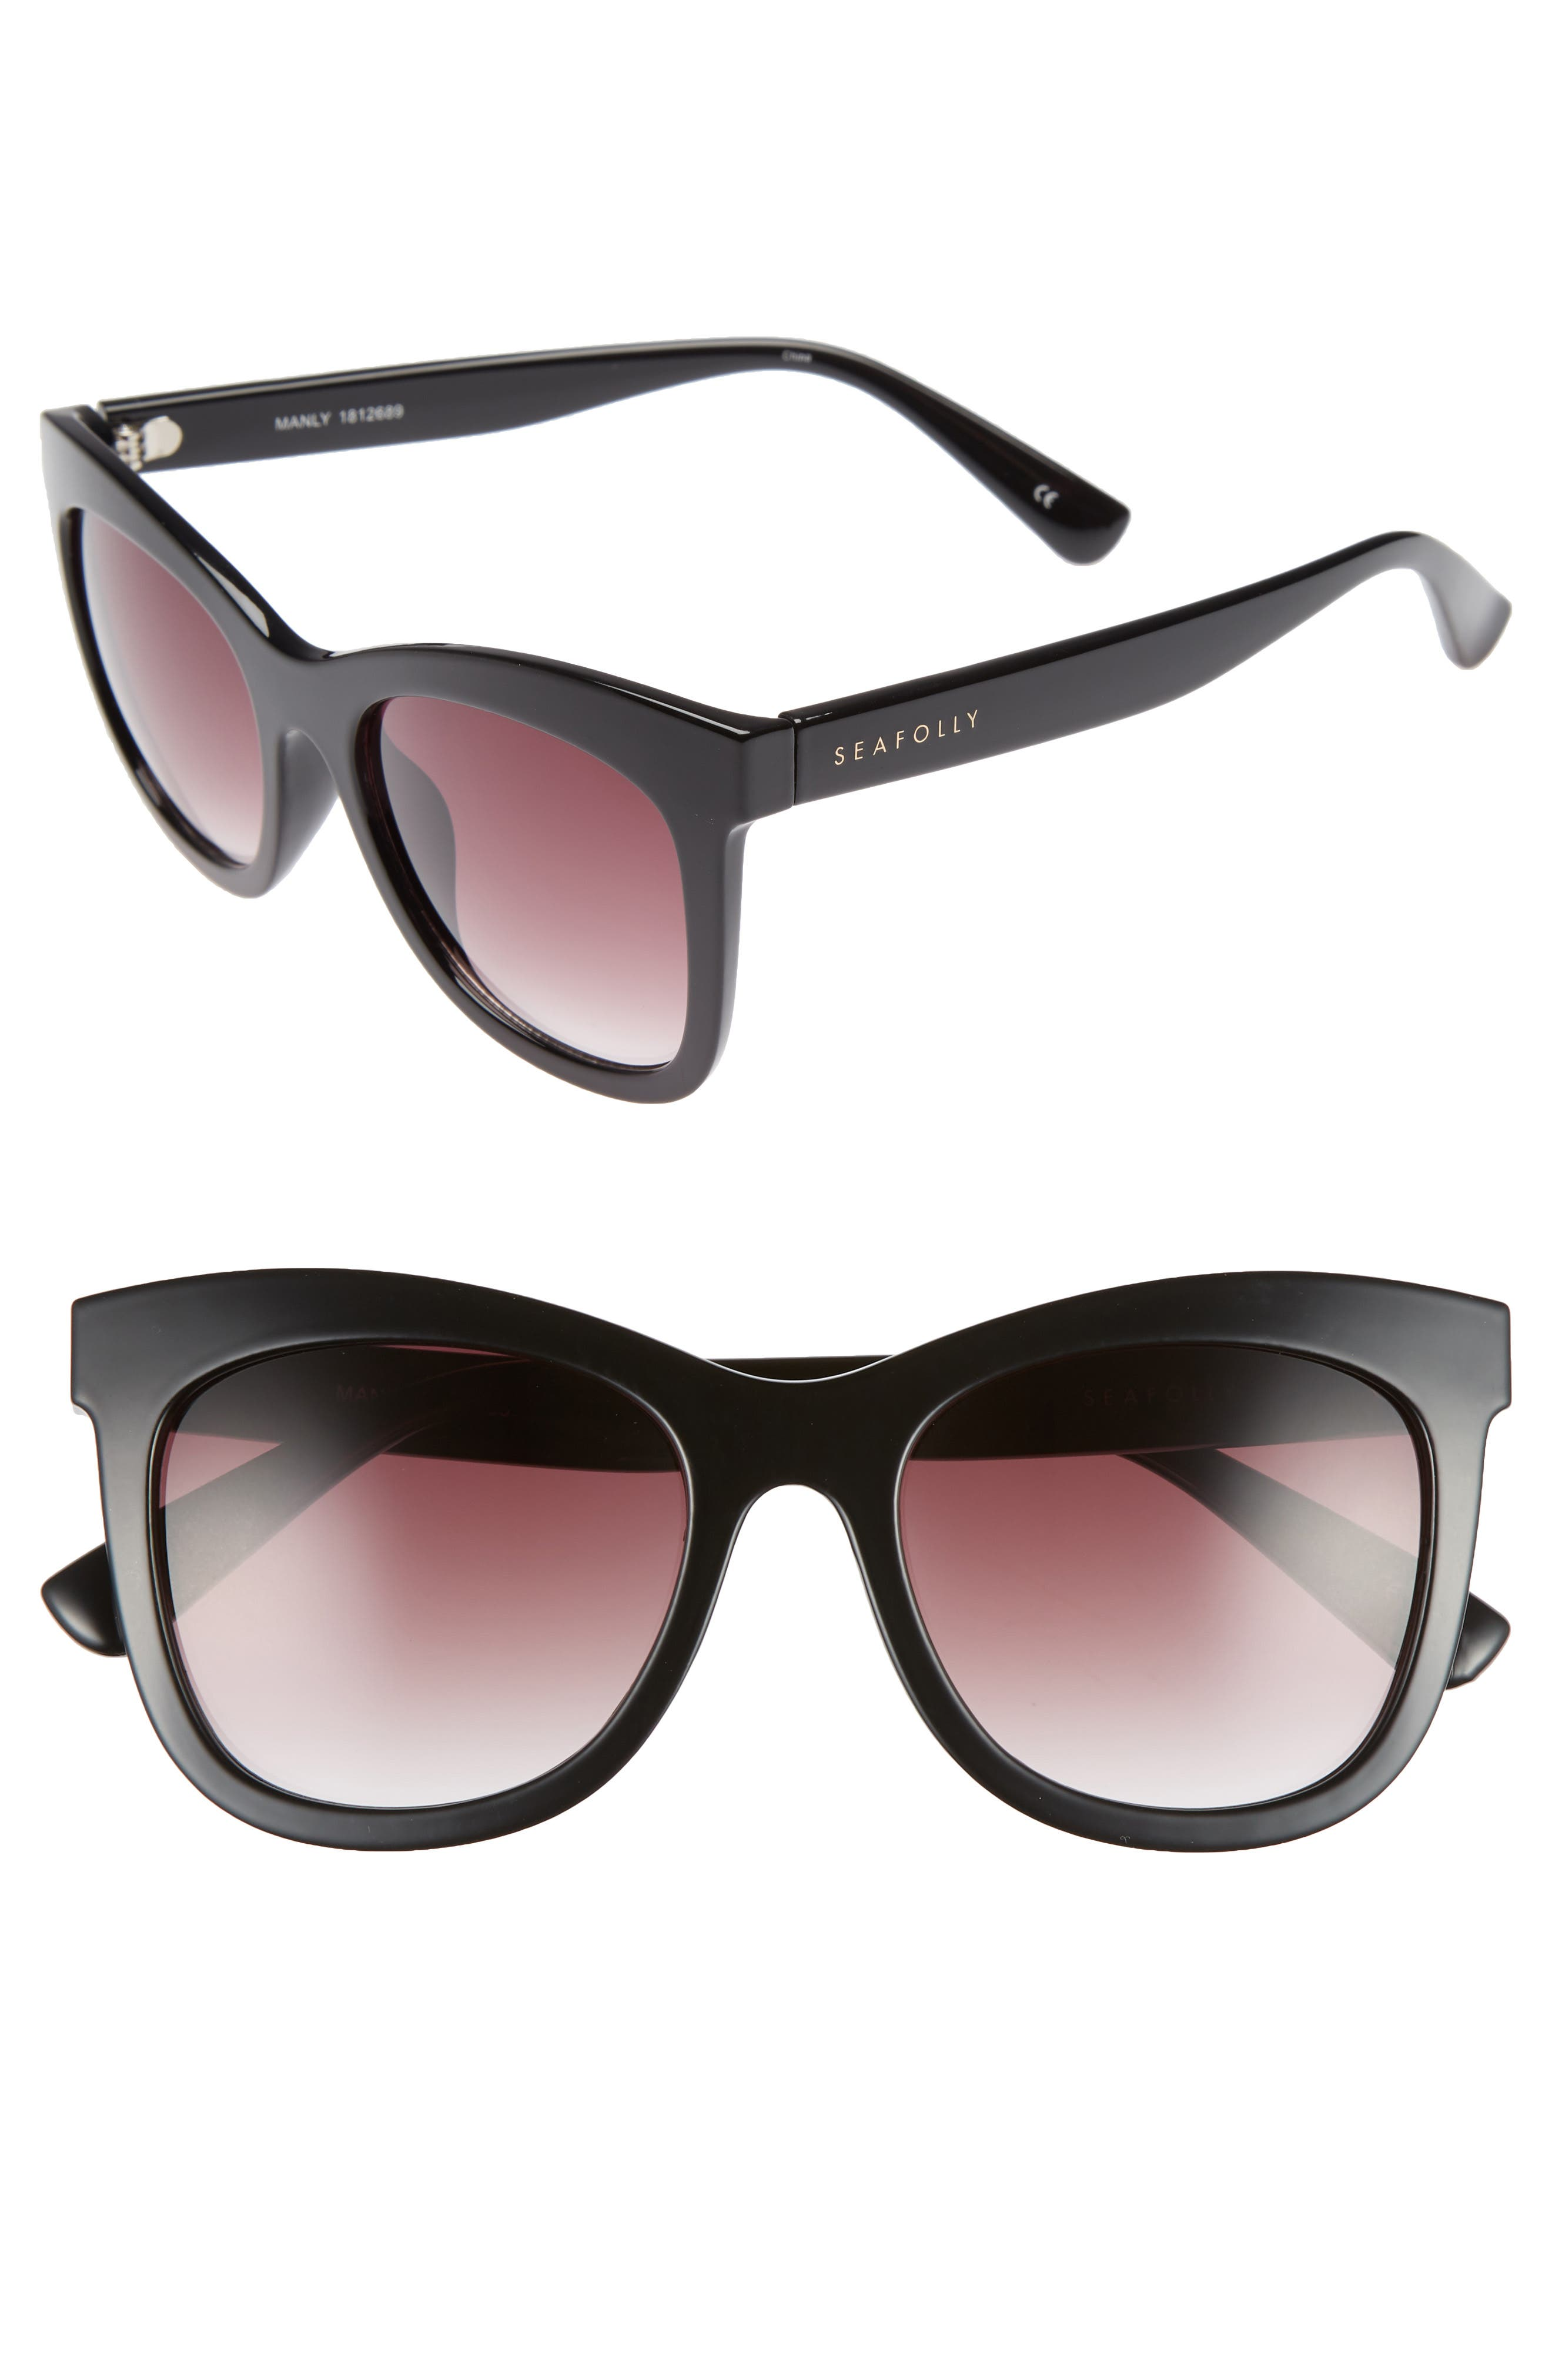 Manly 52mm Cat Eye Sunglasses,                         Main,                         color, Black